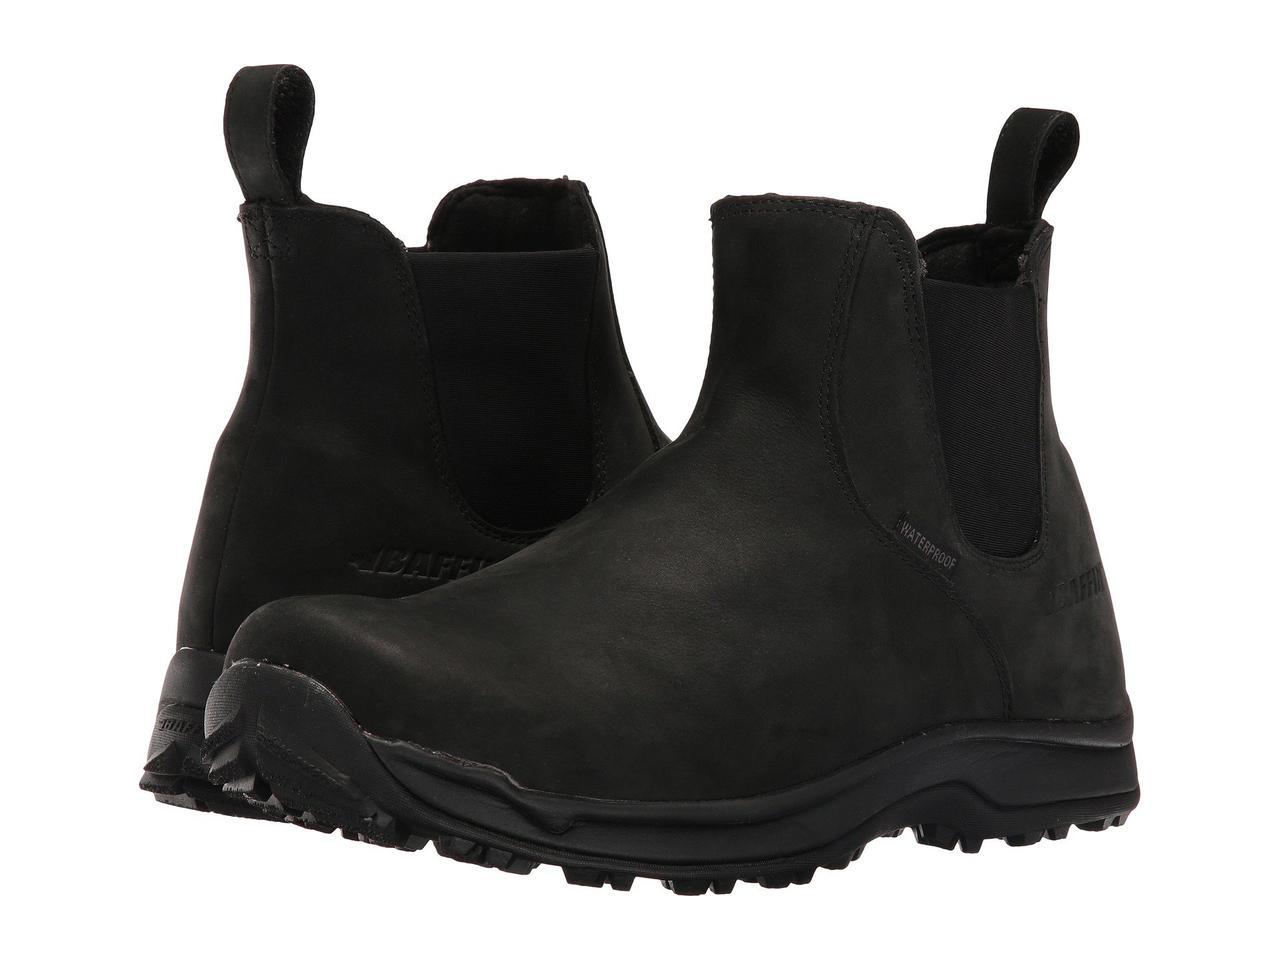 Ботинки/Сапоги (Оригинал) Baffin Copenhagen Black